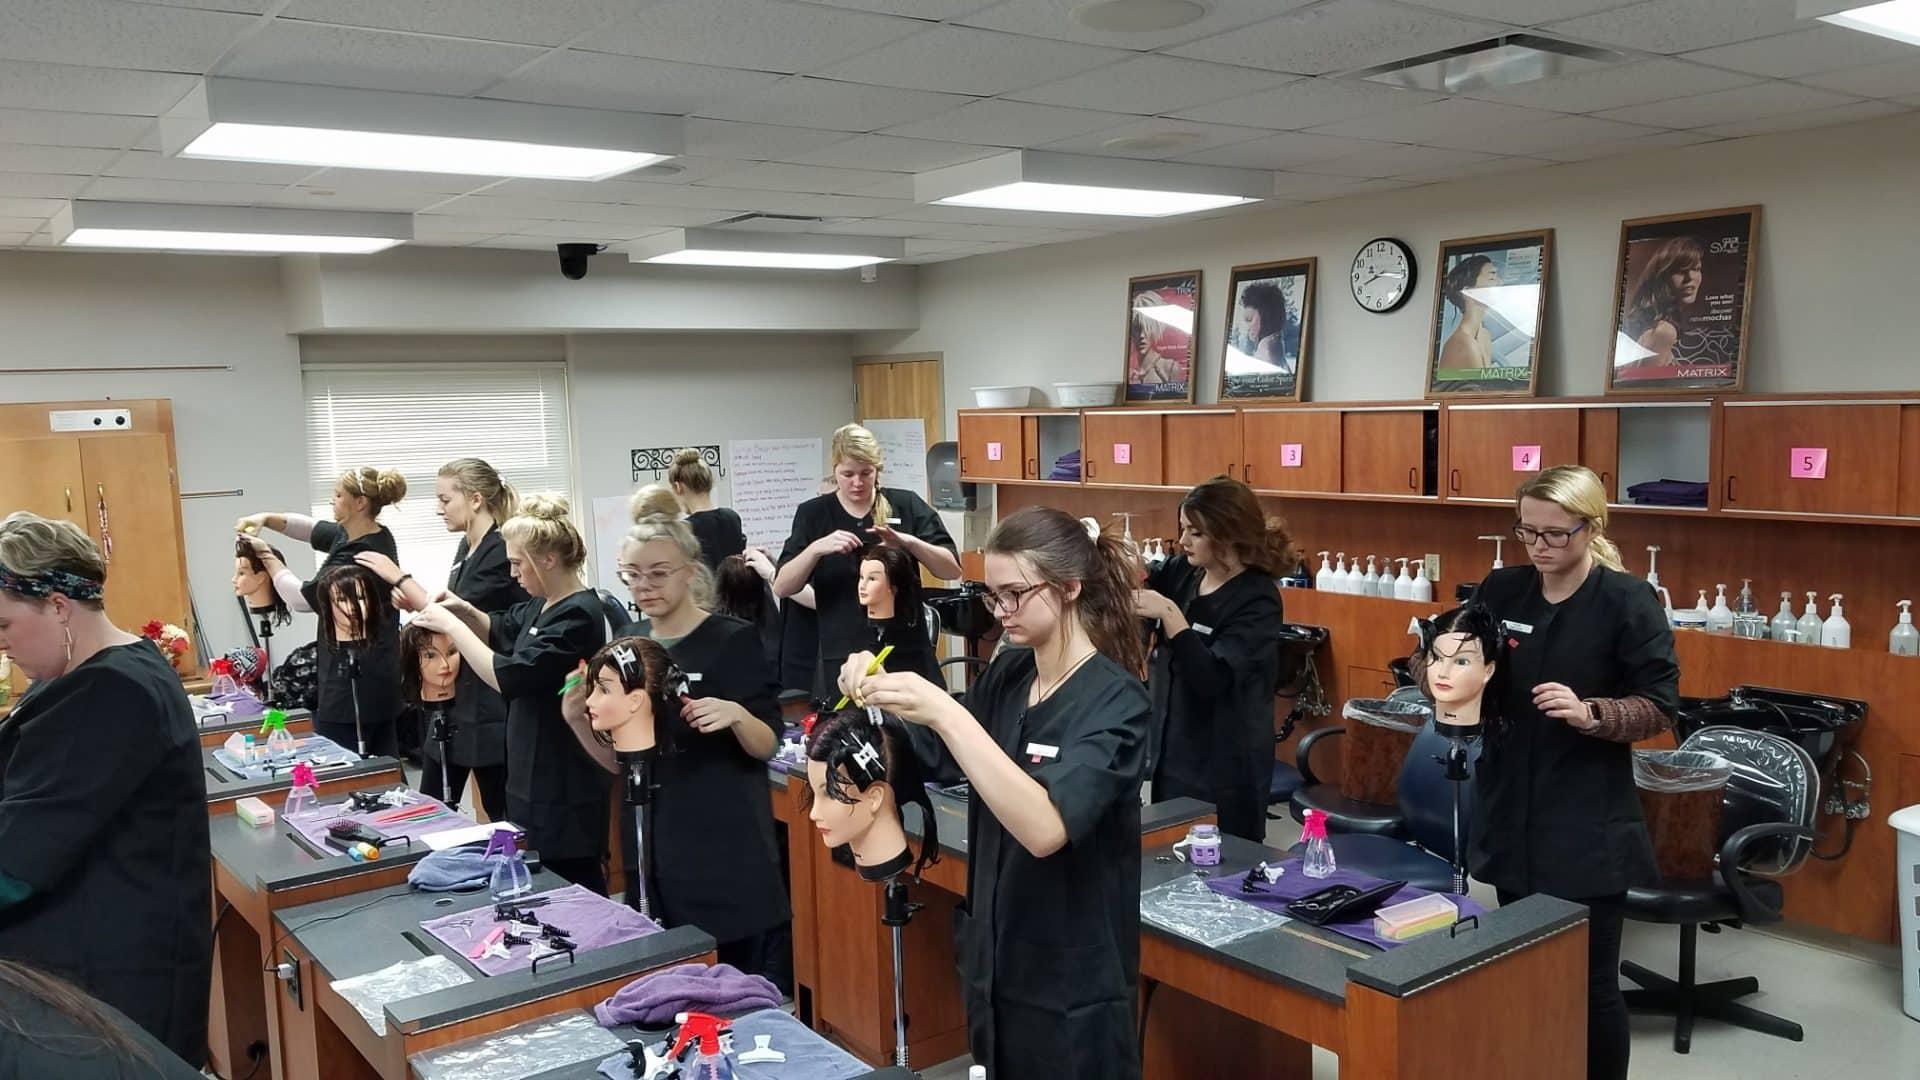 Cosmo students testing on manikin heads